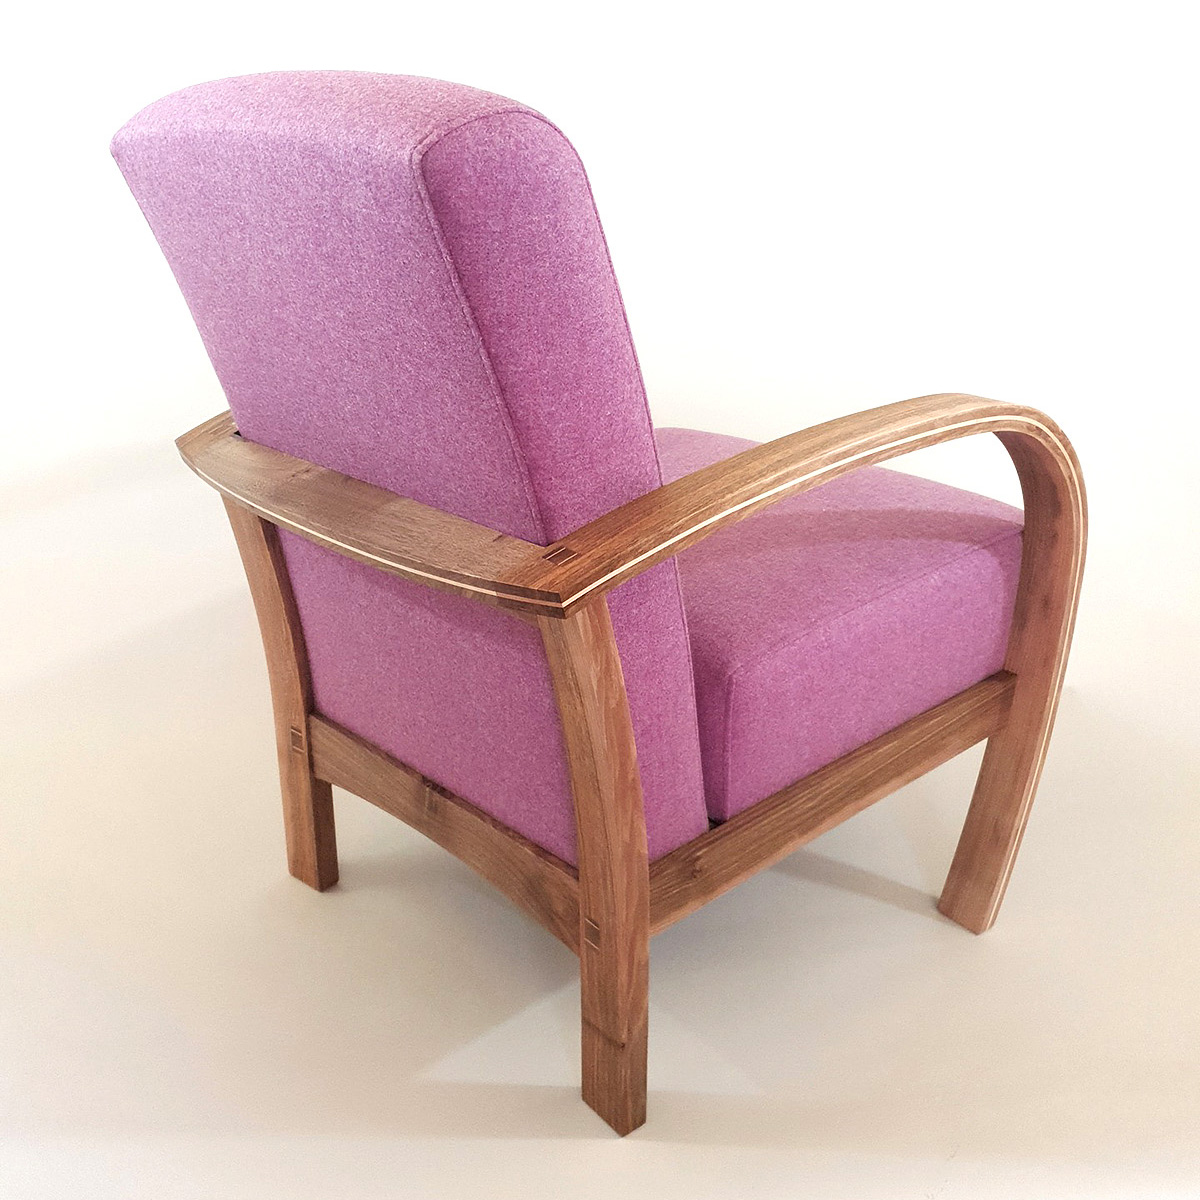 Tom Cooper, 'Deco Flow' armchair, walnut, fabric